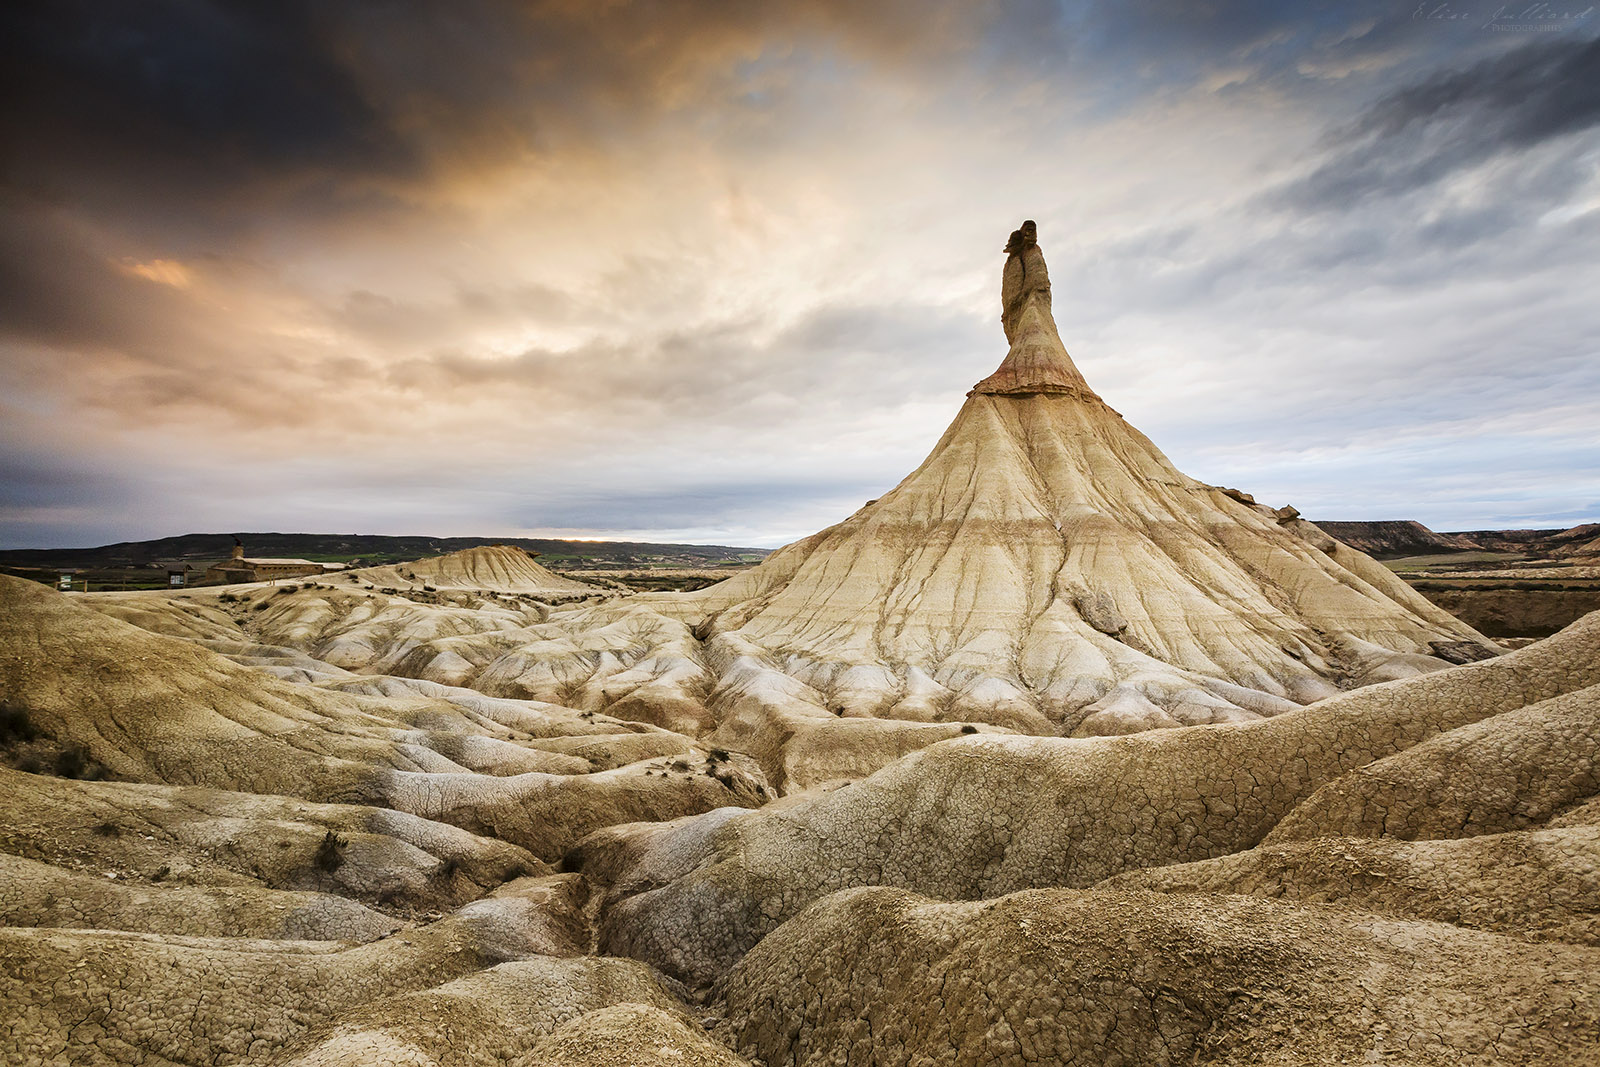 bardenas-reales-de-navarra-castildetierra-paysage-landscape-photographe-elise-julliard-espagne-desert-lac-game-of-thrones-tudela-navarre-arguedas-voyage